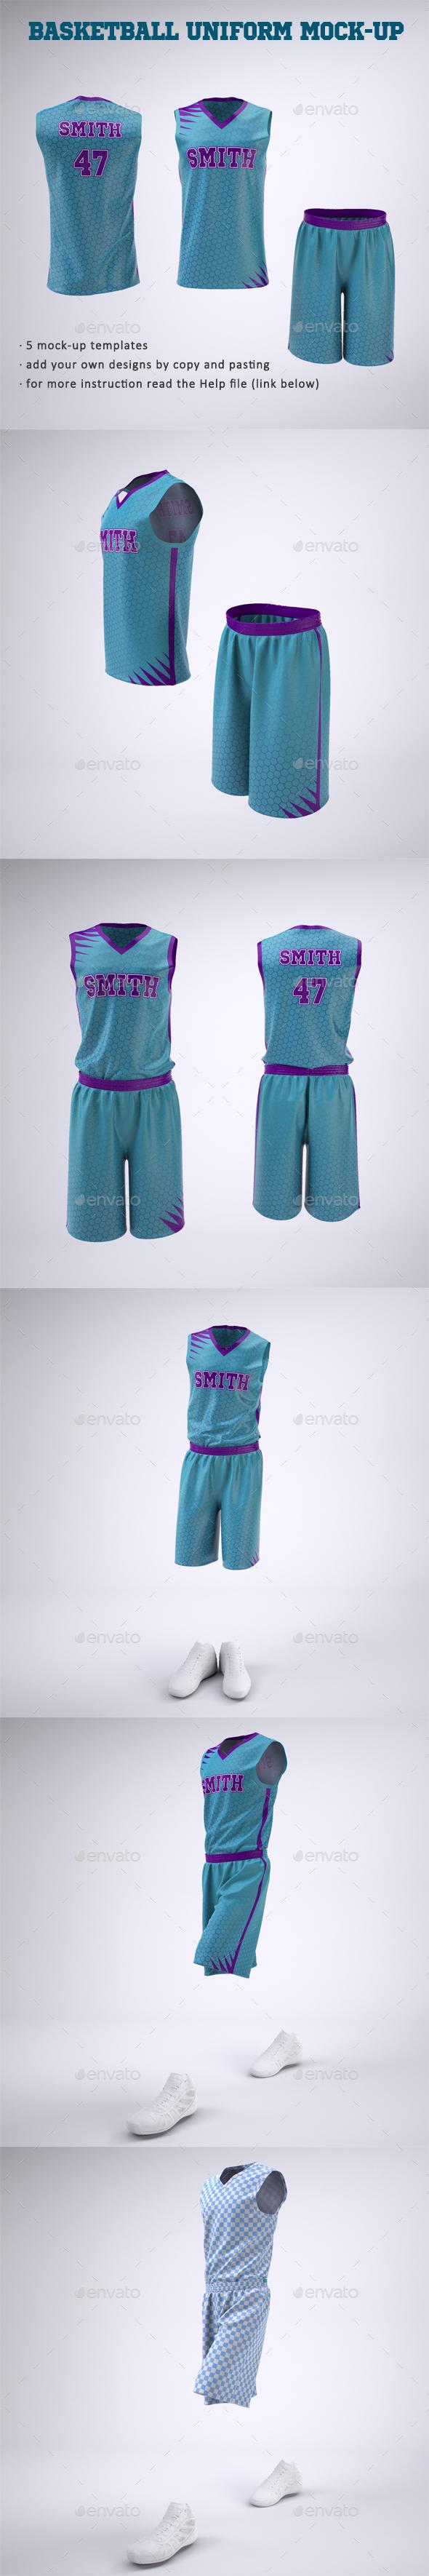 Basketball Jersey and Shorts Uniform Mock-Up - Apparel Product Mock-Ups